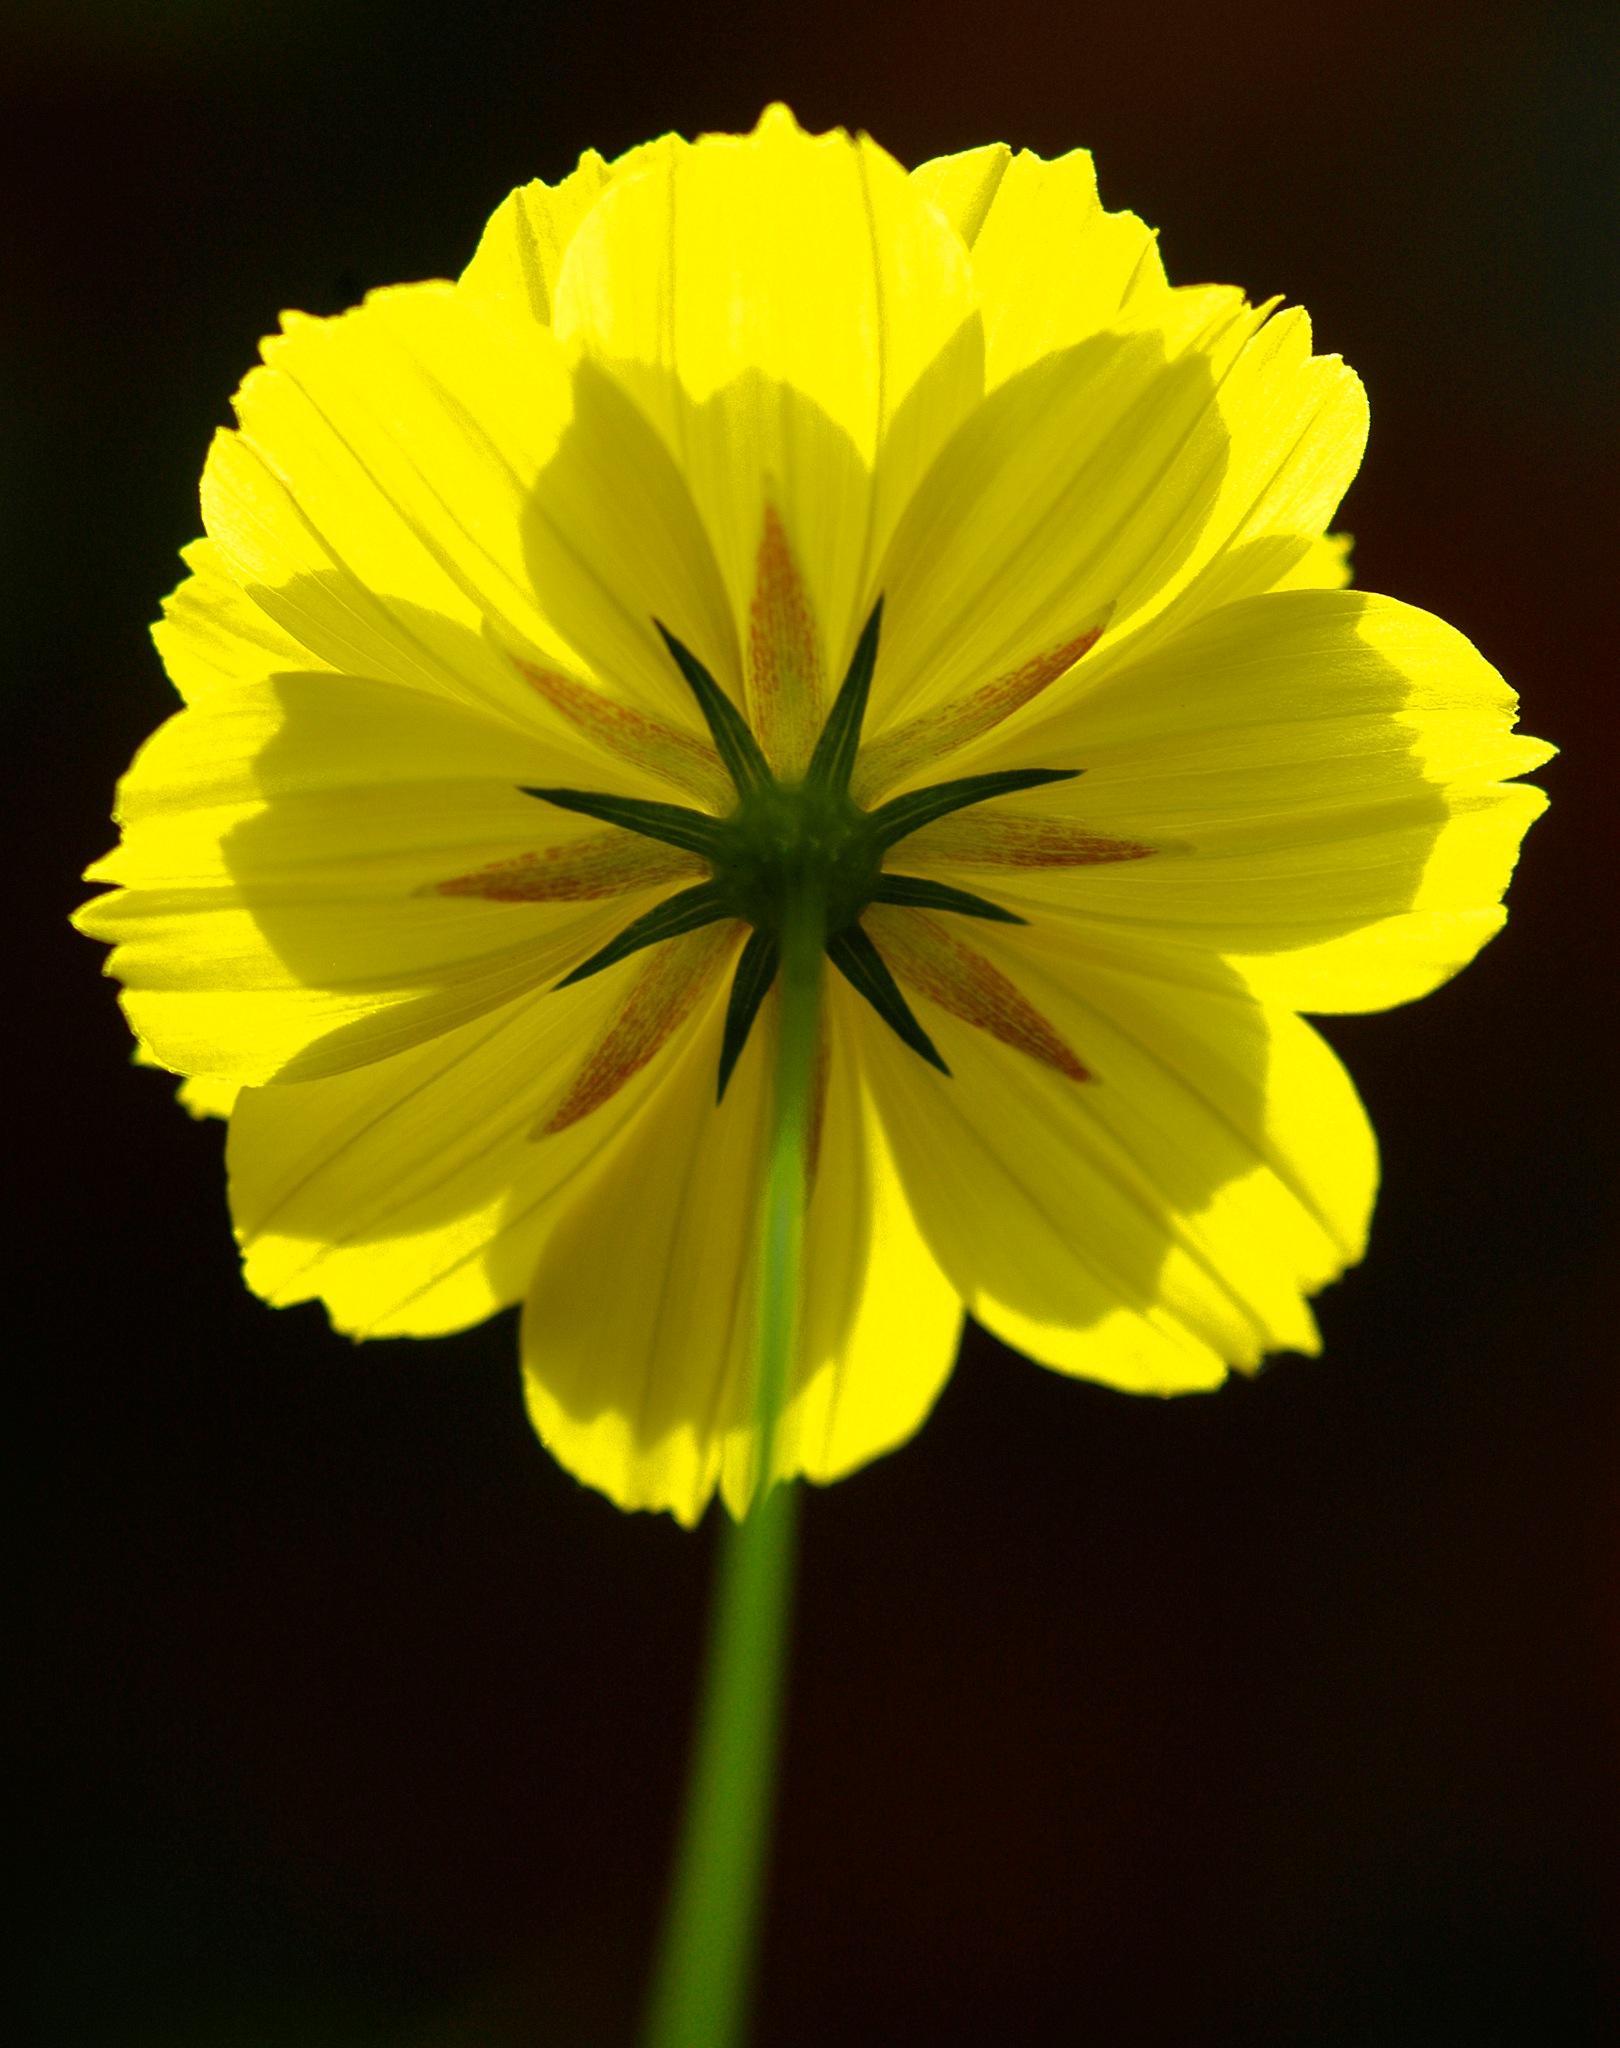 Yellow flower by sajan k s